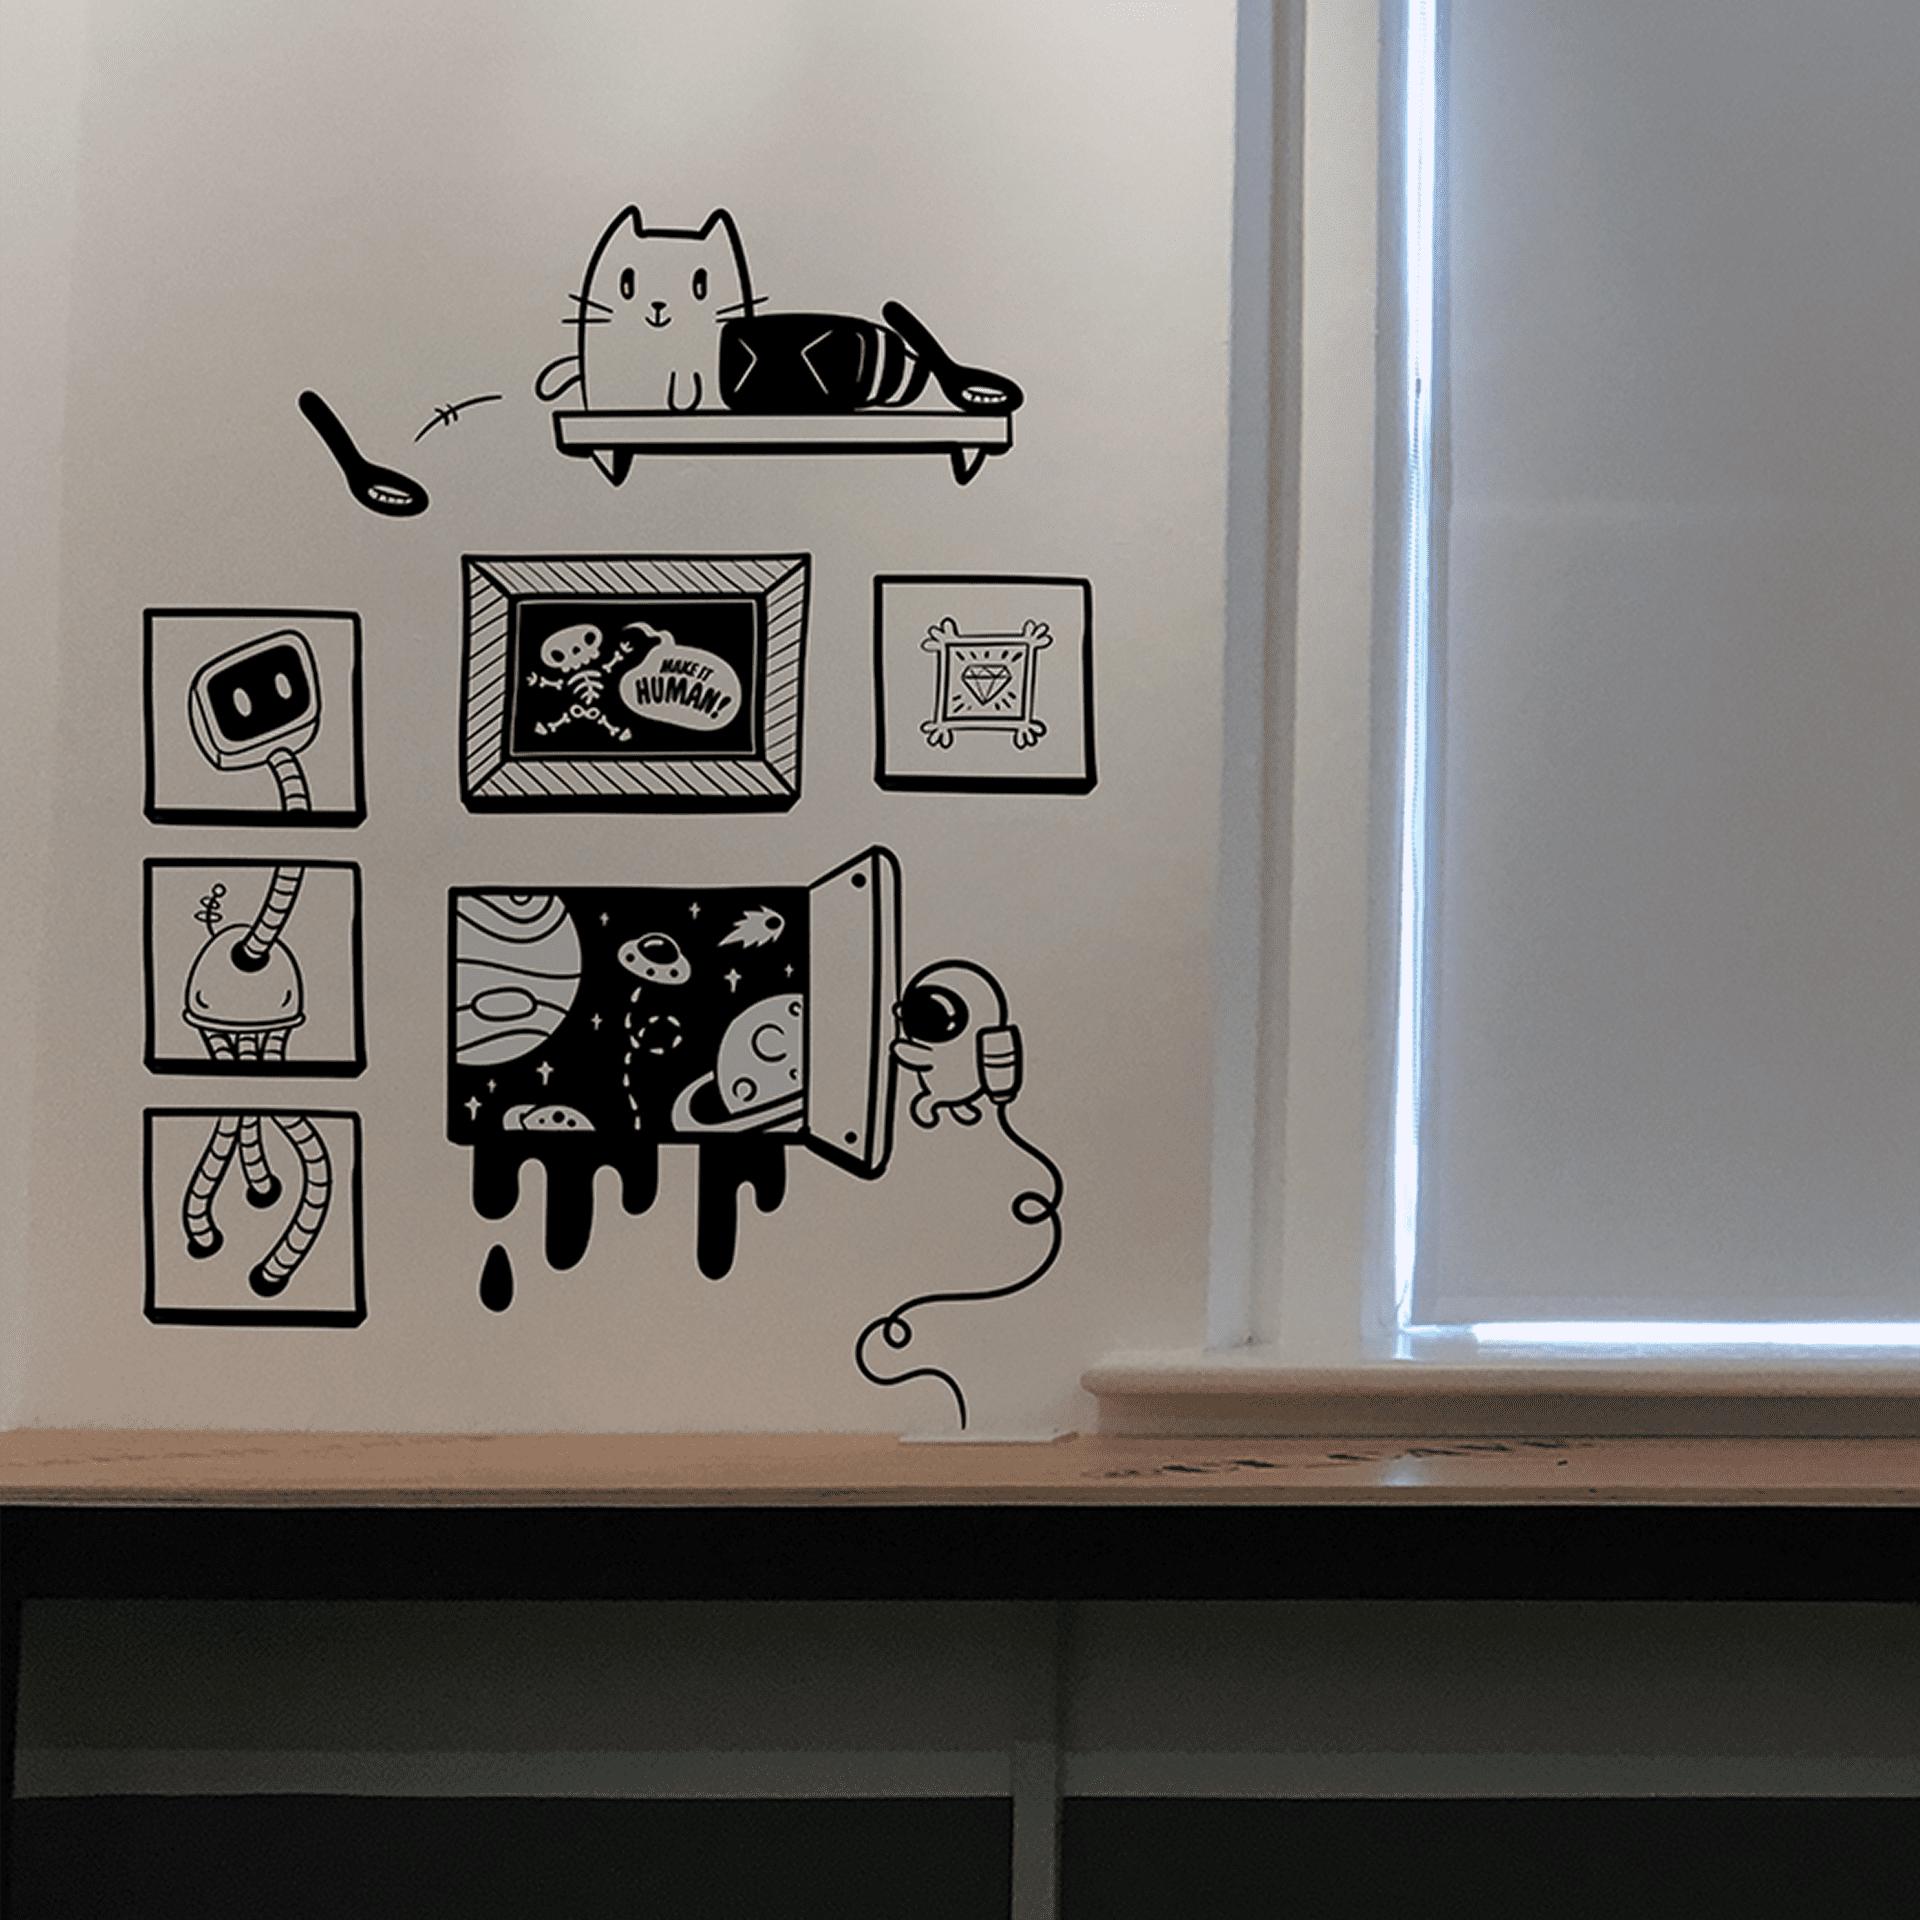 CI mural design